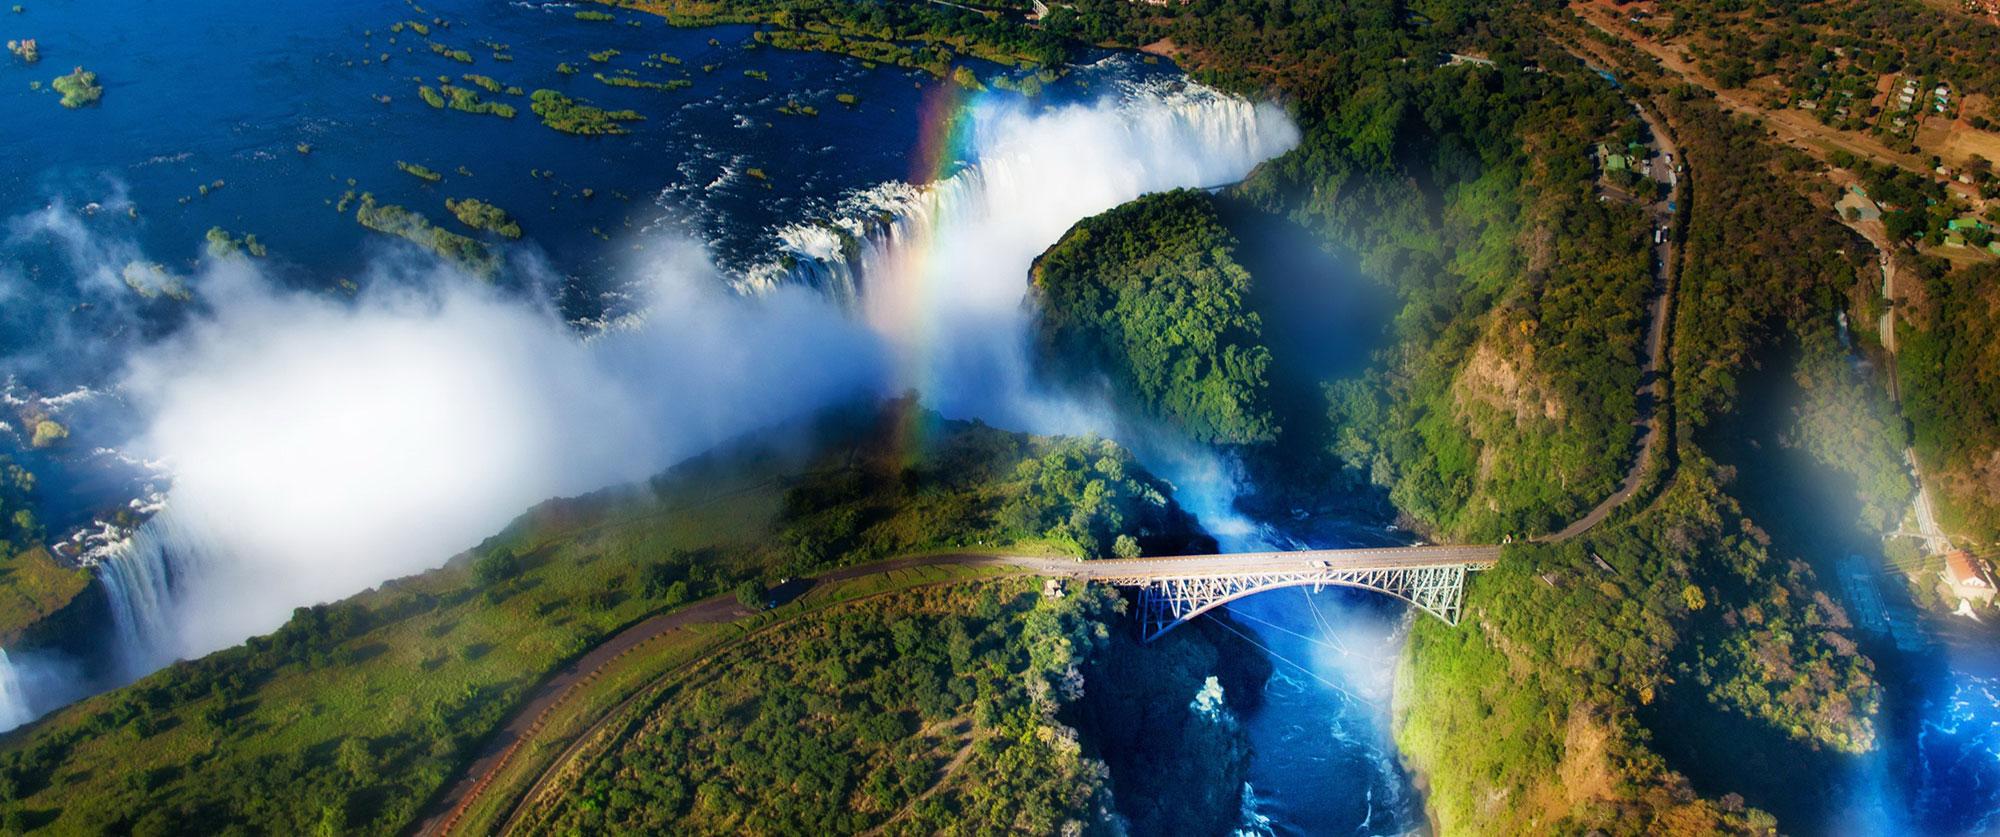 Zimbabwe - Victoria Falls safari and tours, Rovos Rail itineraries